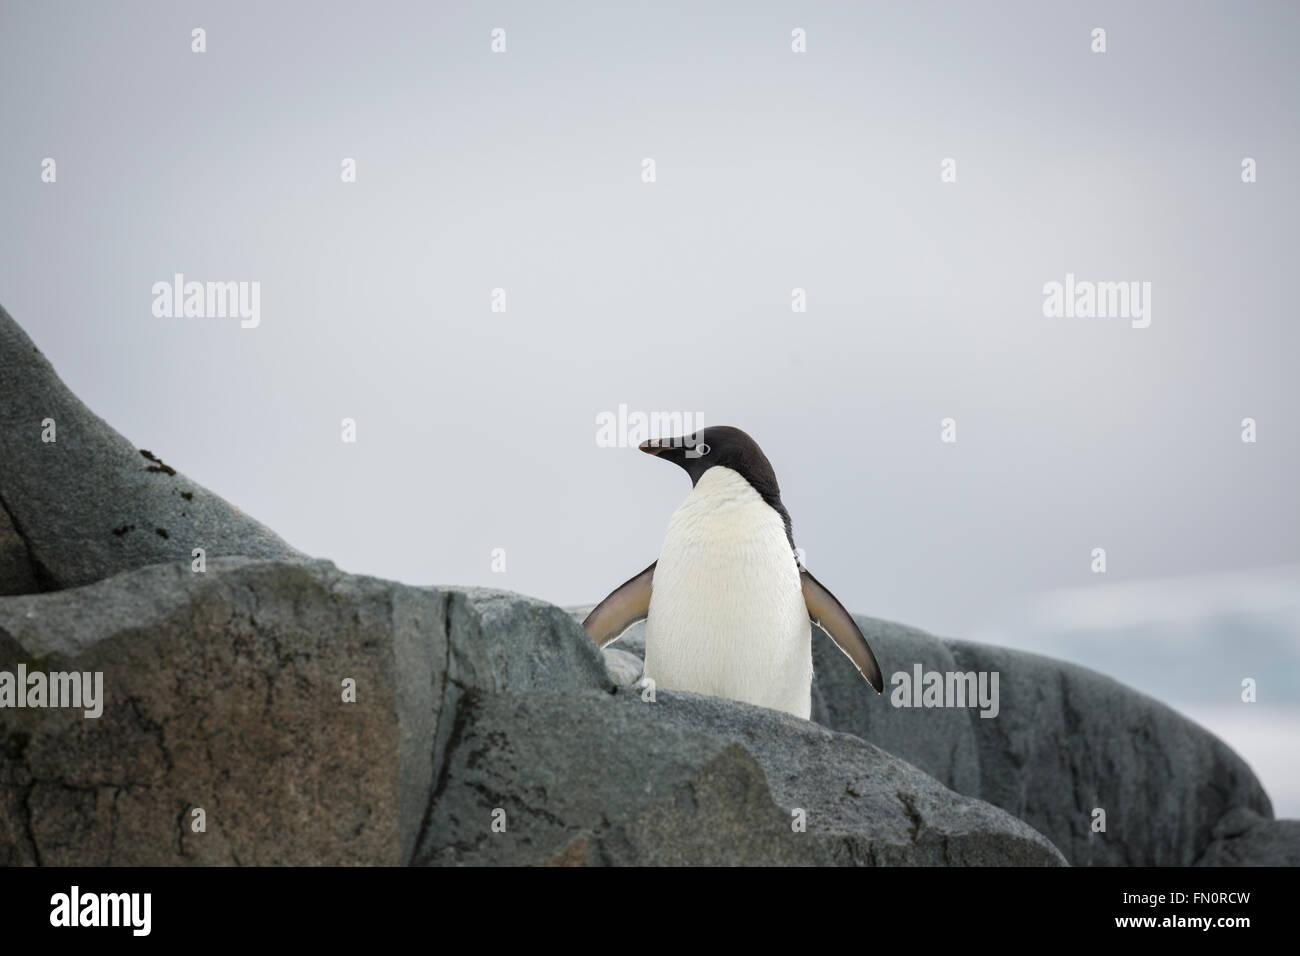 La Antártida, en la península Antártica, Isla Petermann, pingüinos Adelia. Imagen De Stock